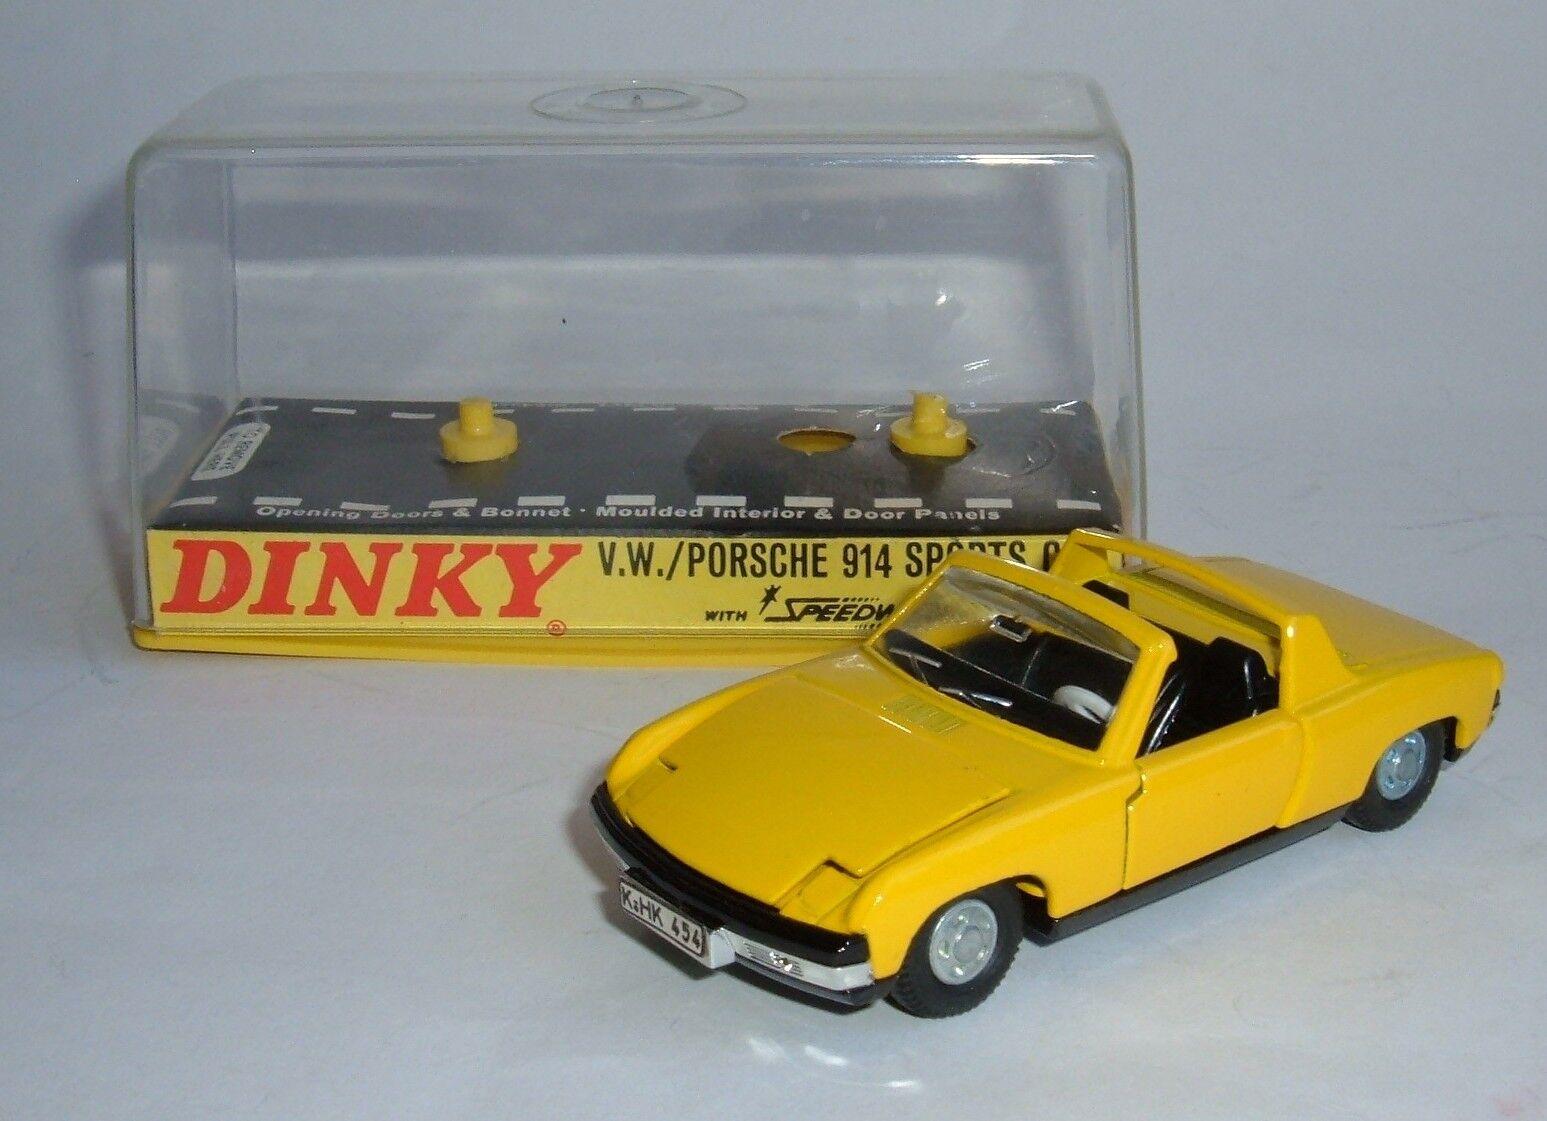 DINKY TOYS No 208, VW Porsche 914 voiture sport, - Superbe Comme neuf.